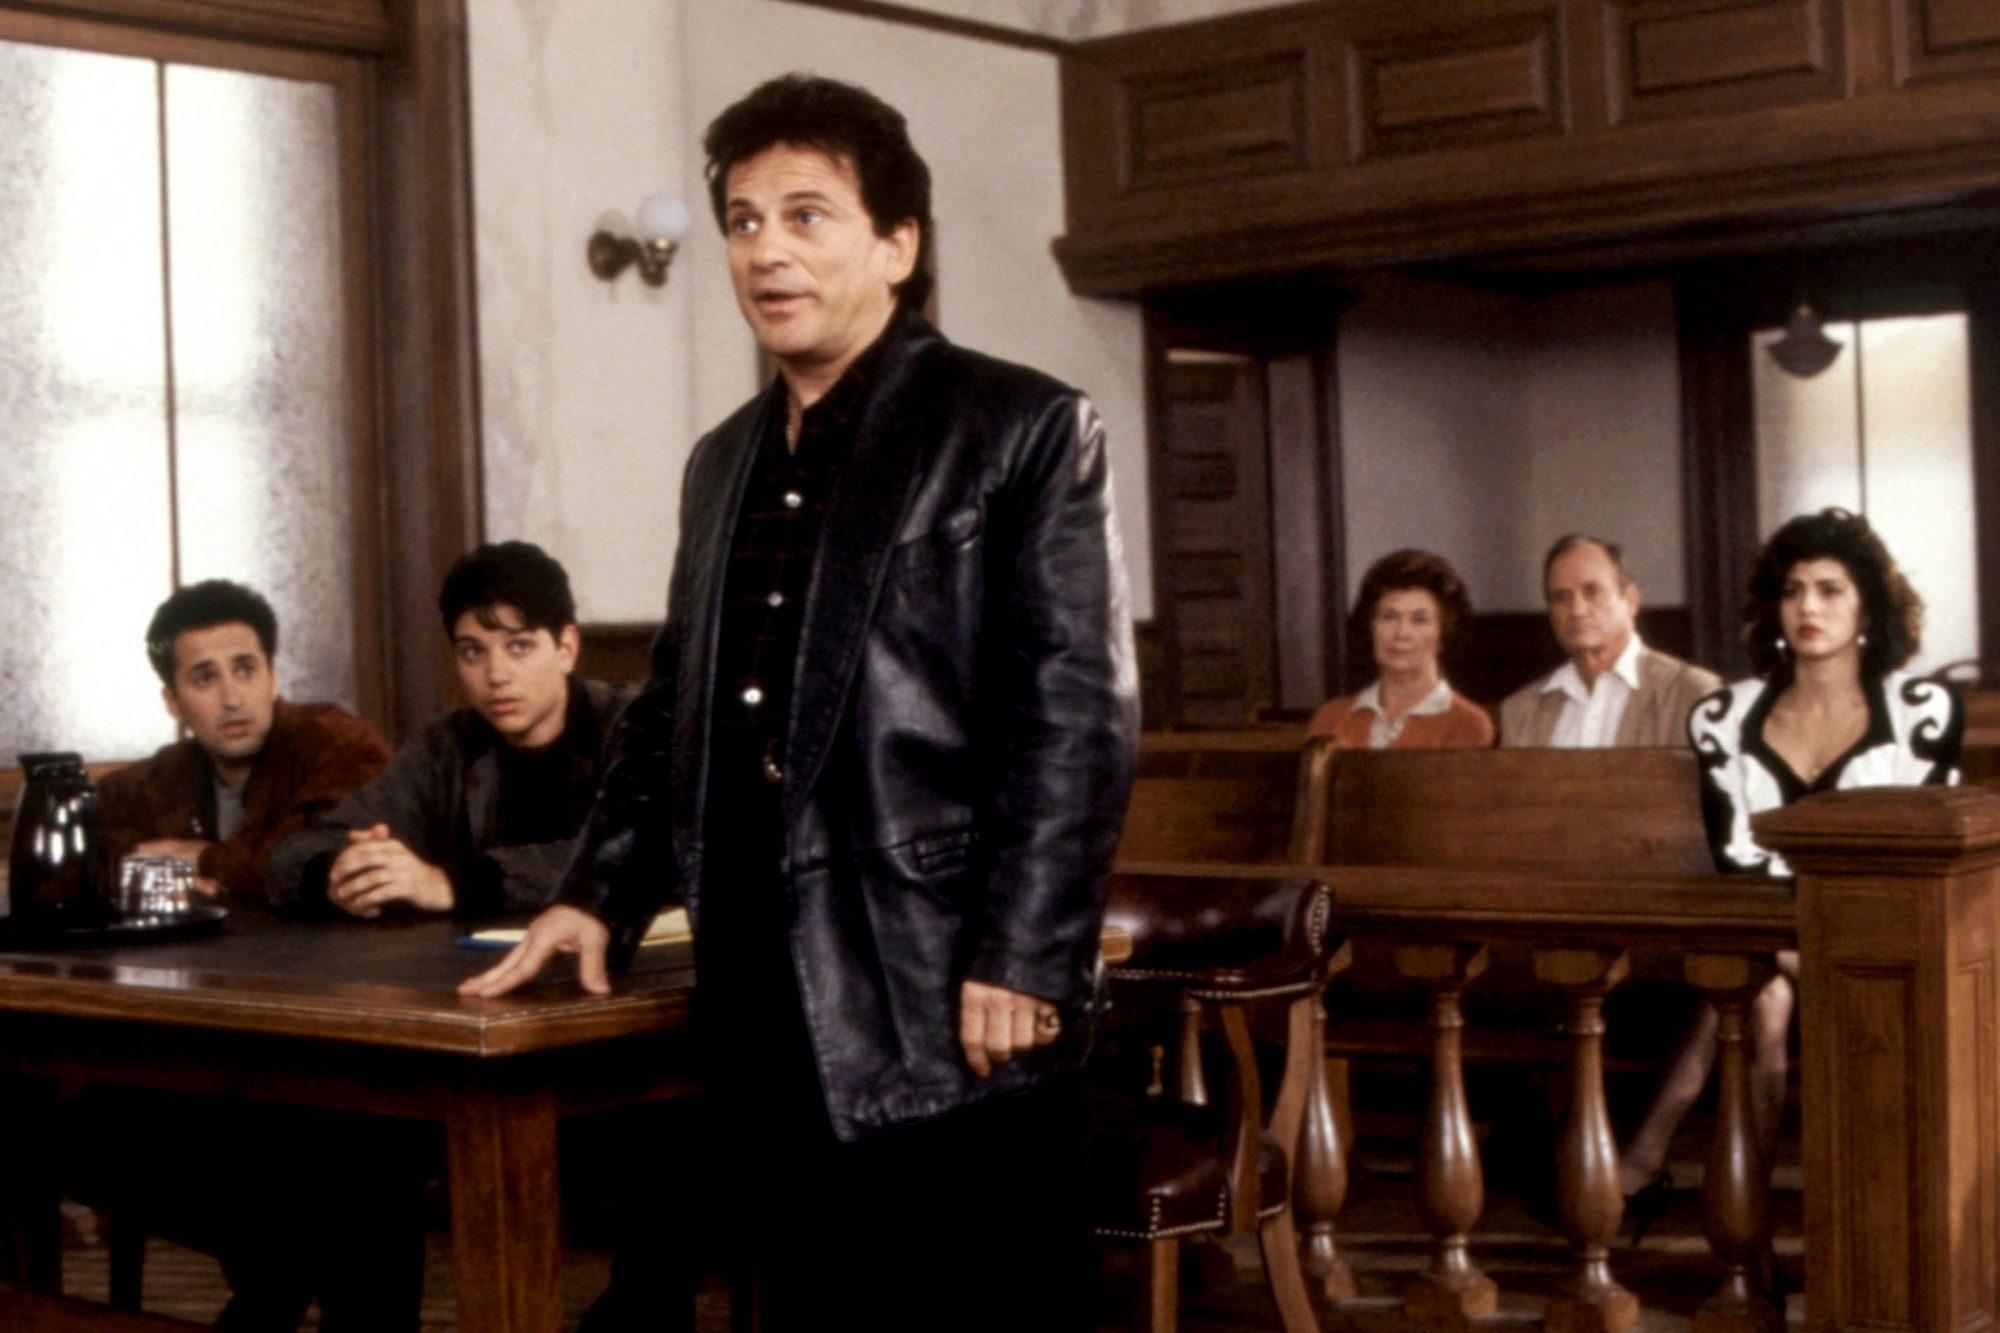 MY COUSIN VINNY, Mitchell Whitfield (far left), Ralph Macchio (second from left), Joe Pesci (third f